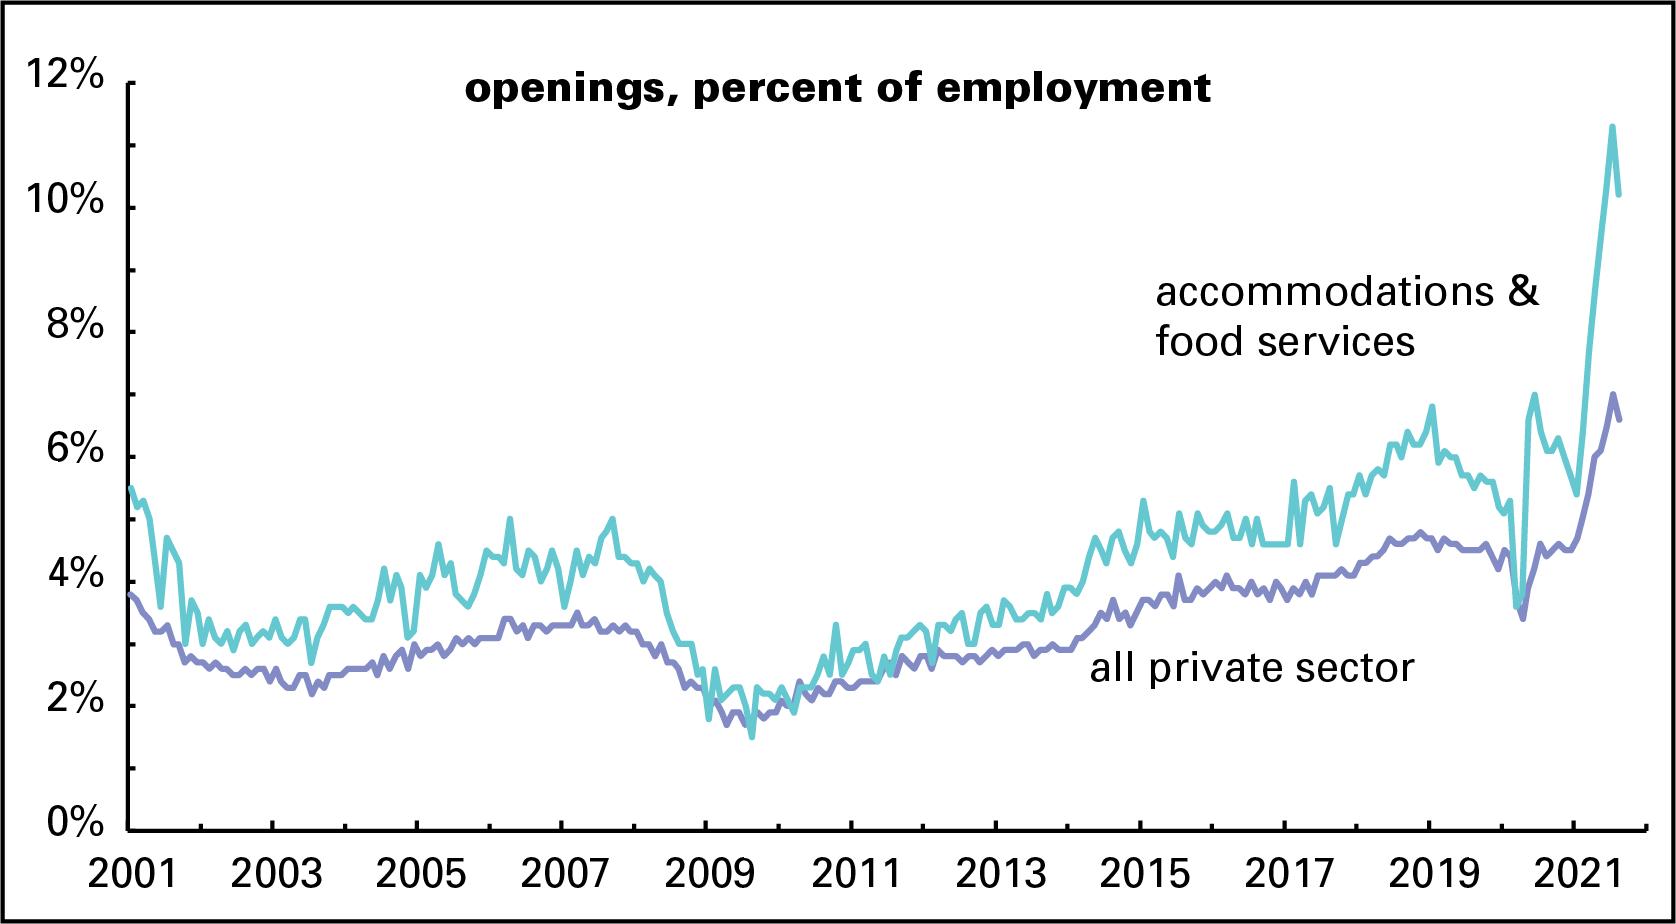 Openings rate